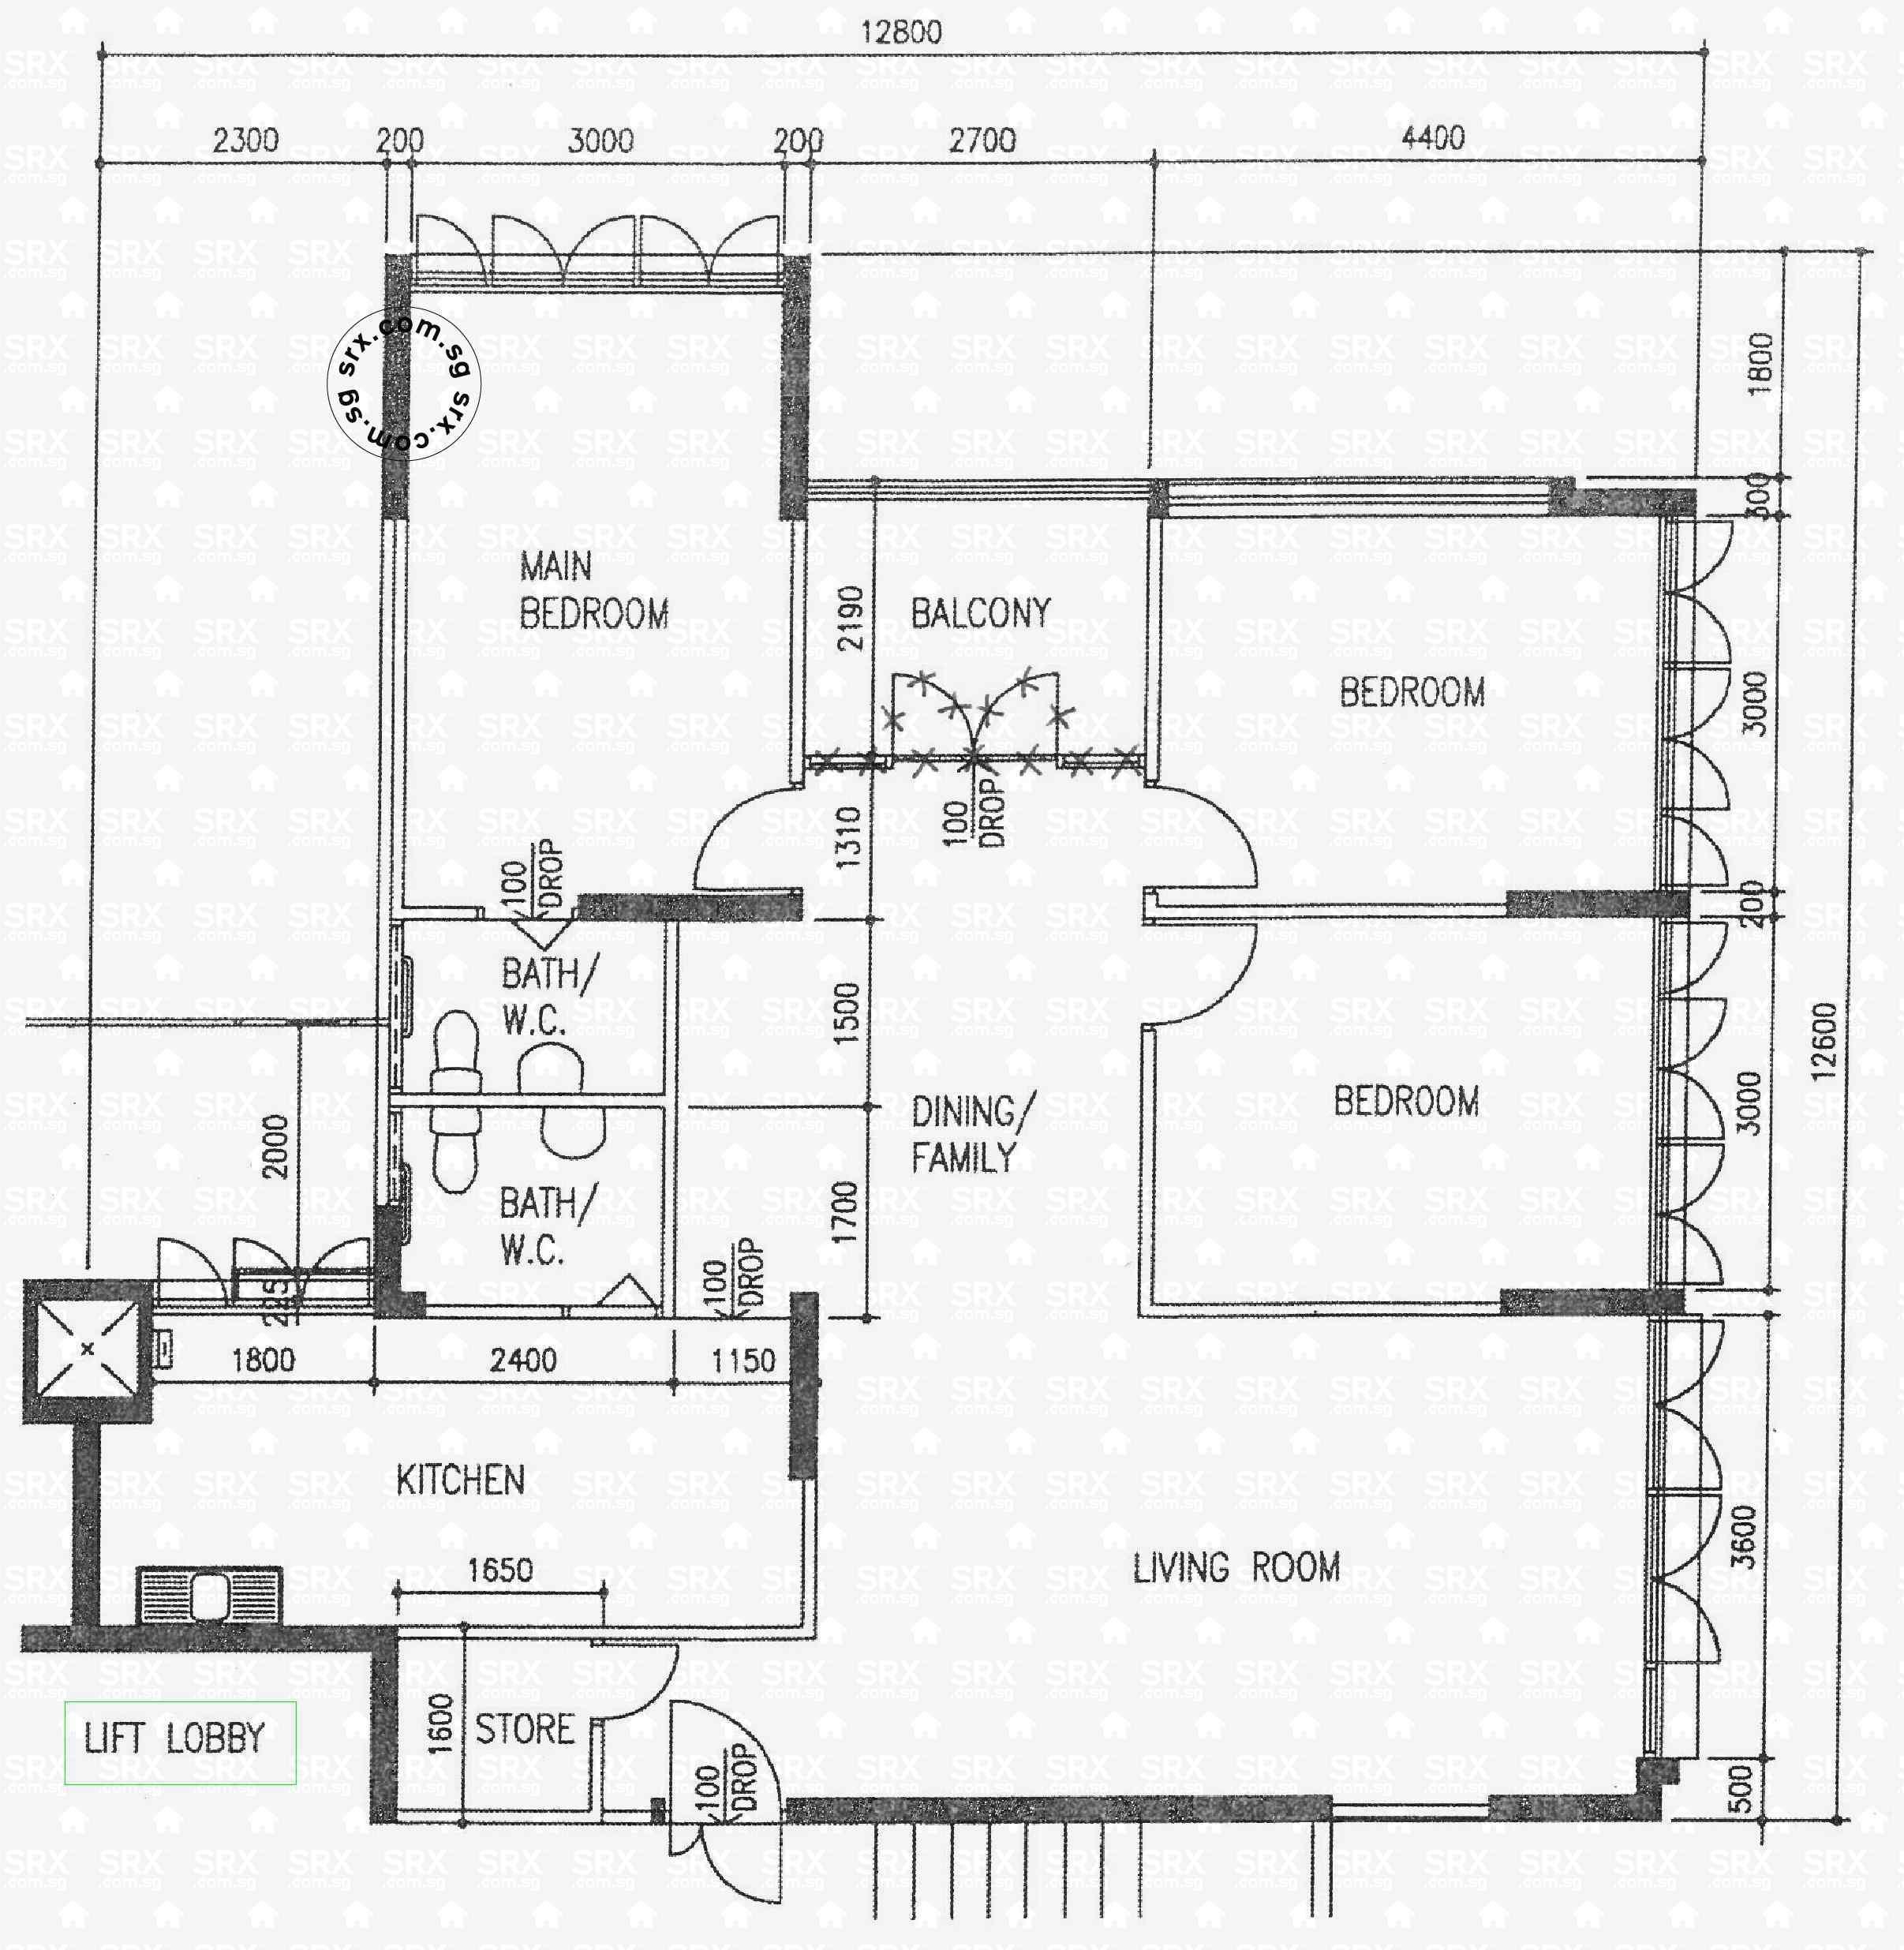 460 Ang Mo Kio Avenue 10 S 560460 Hdb Details Srx Property